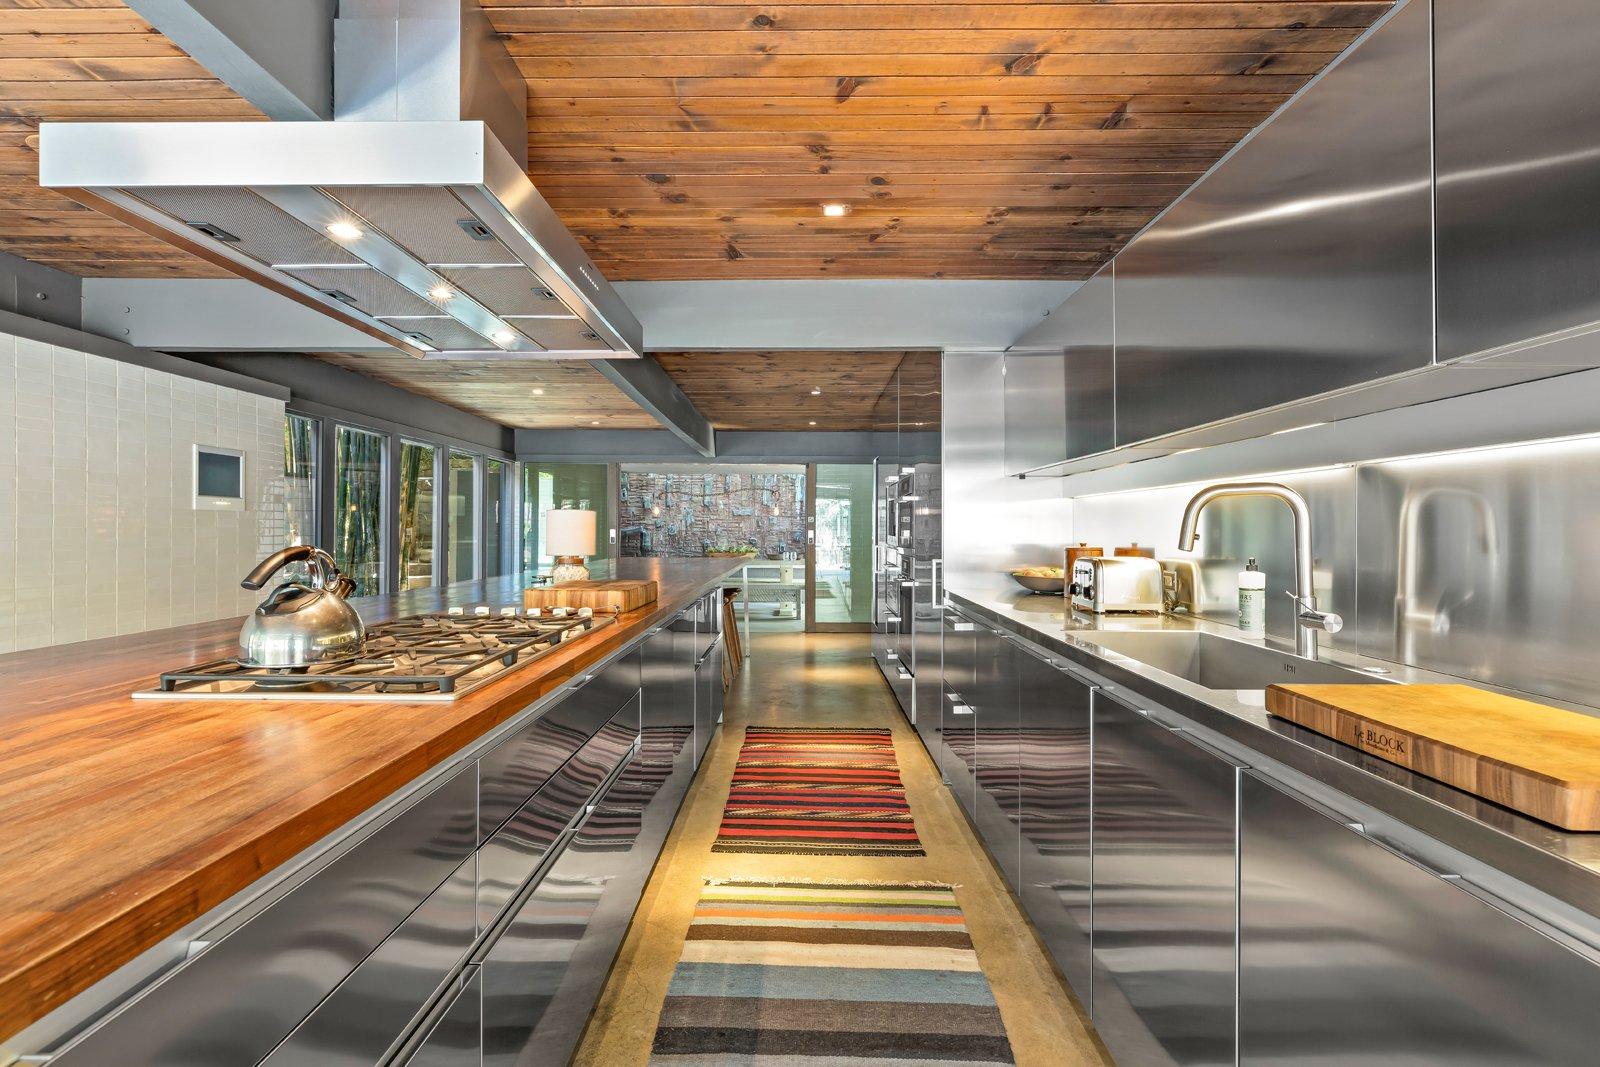 Ajioka House kitchen